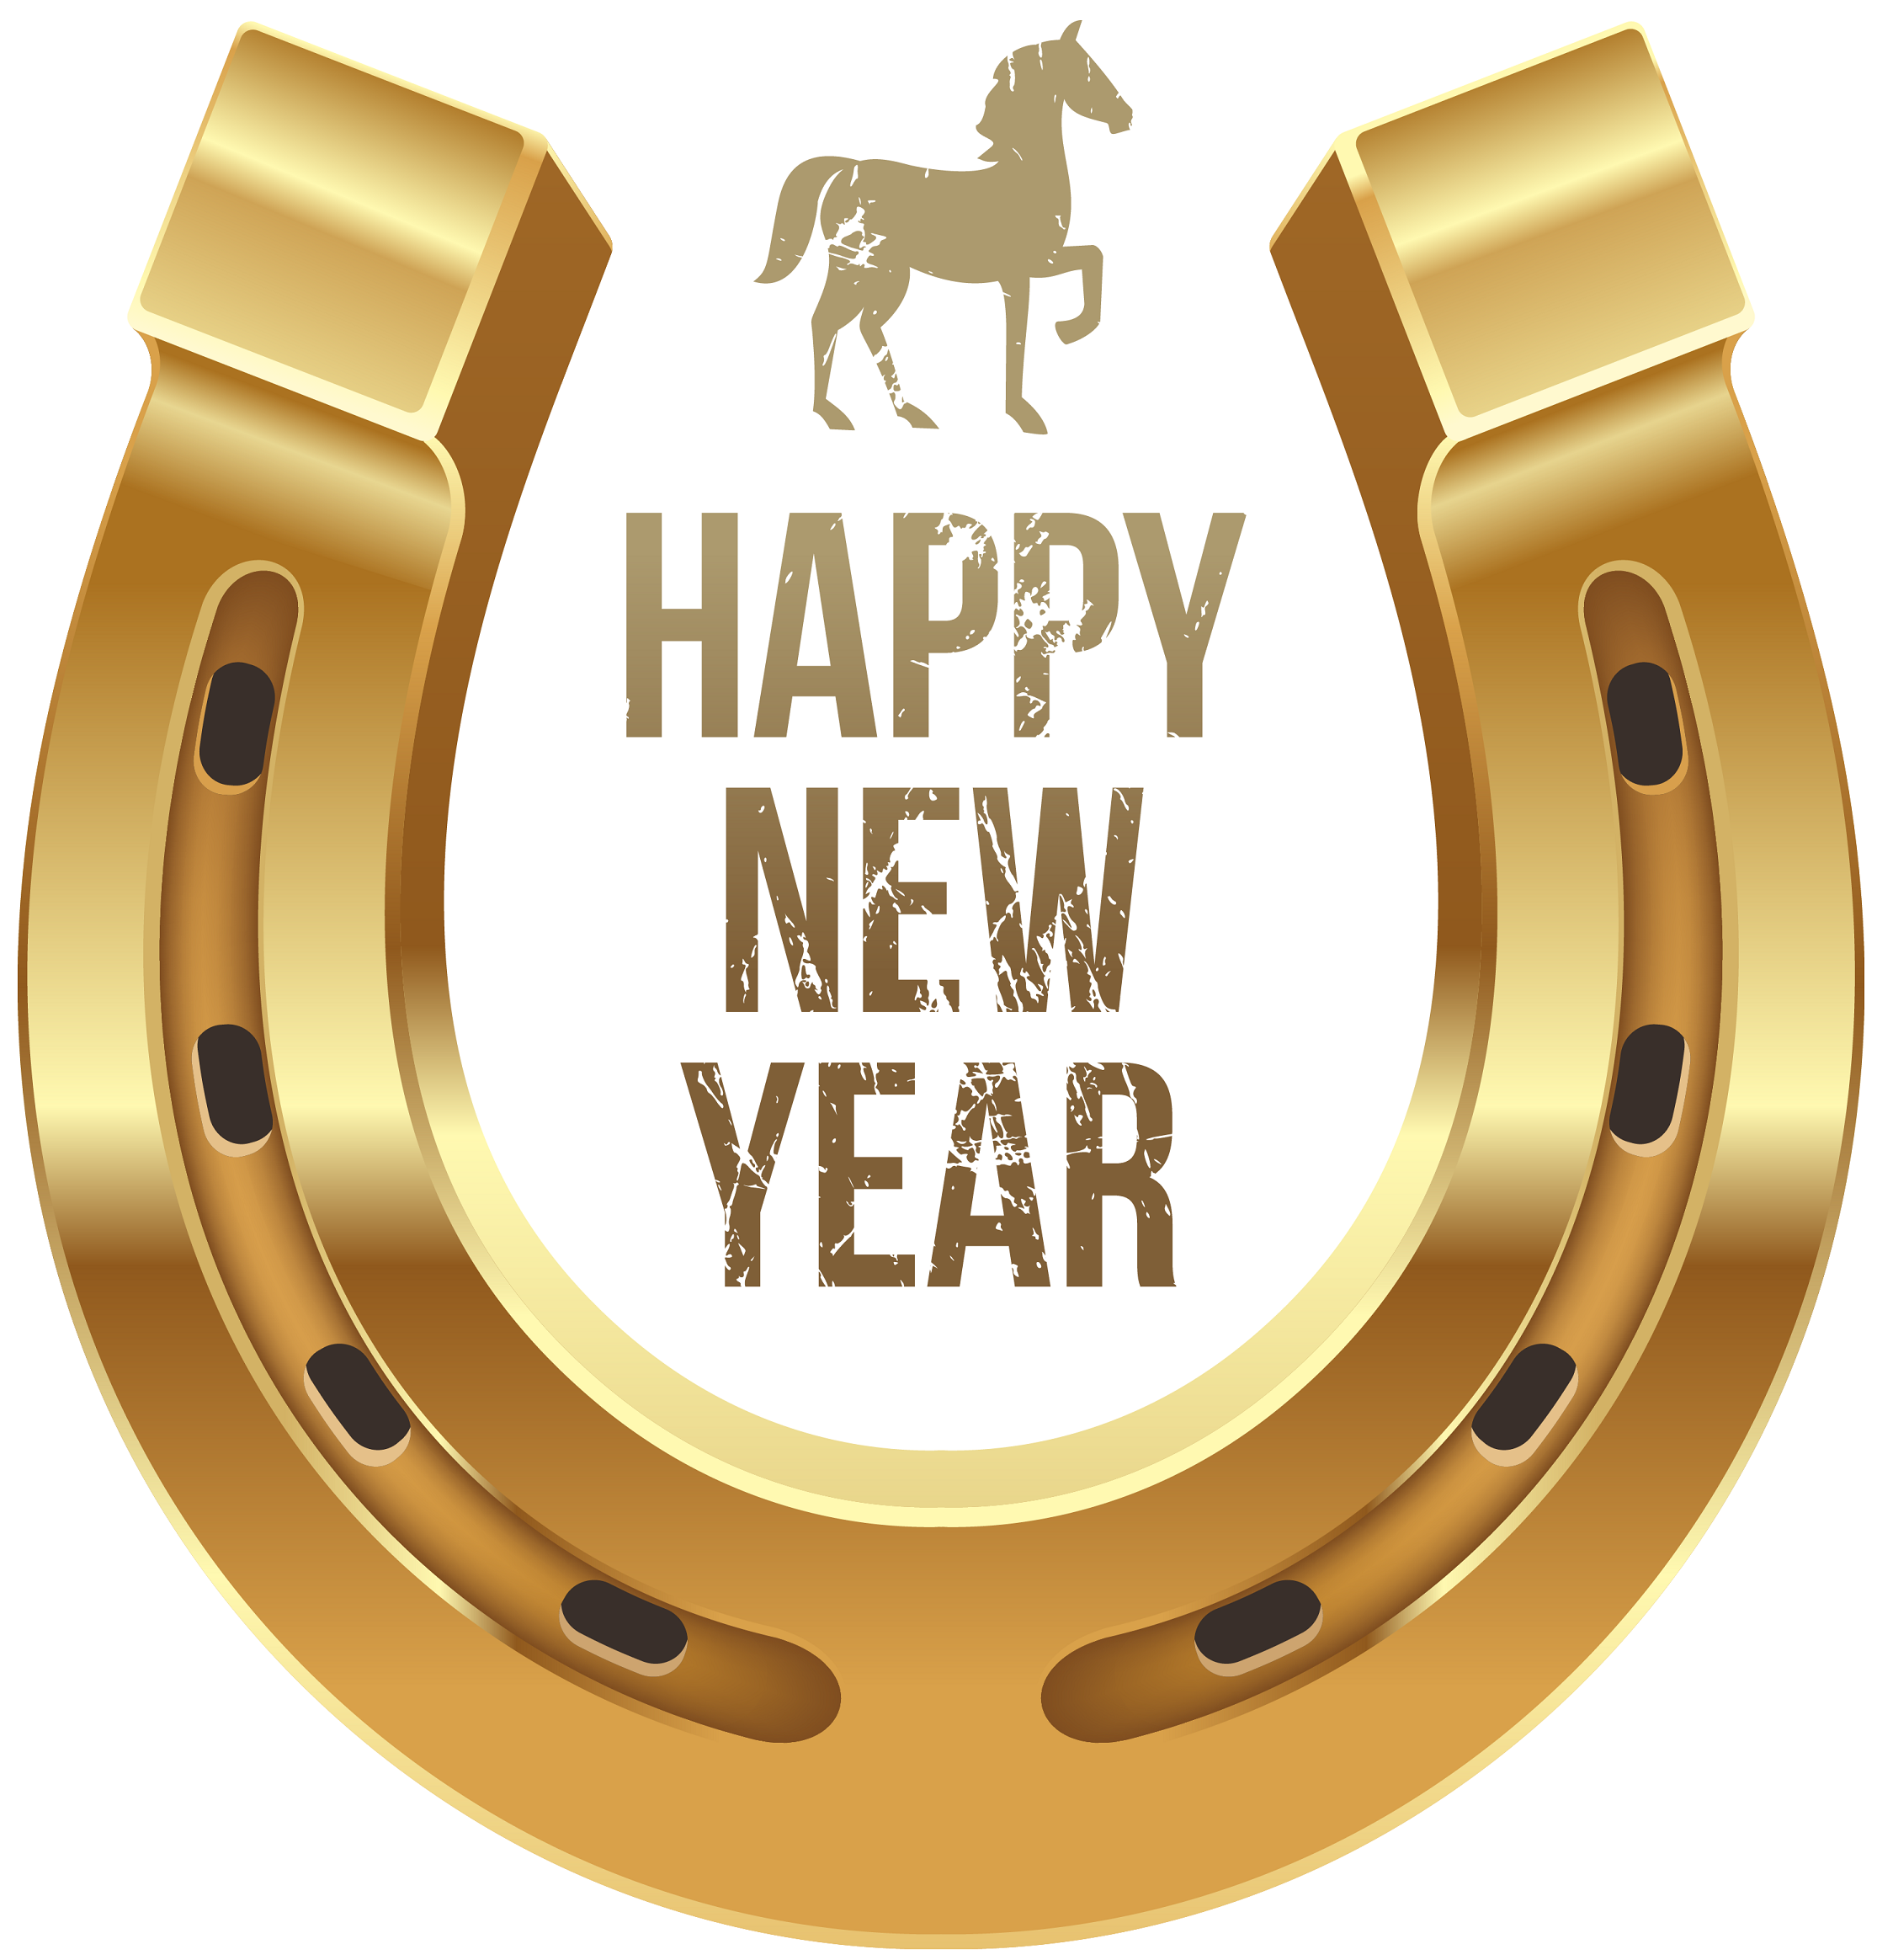 Happy New Year good luck horseshoe | Happy new year png, Vintage happy new  year, Happy new year